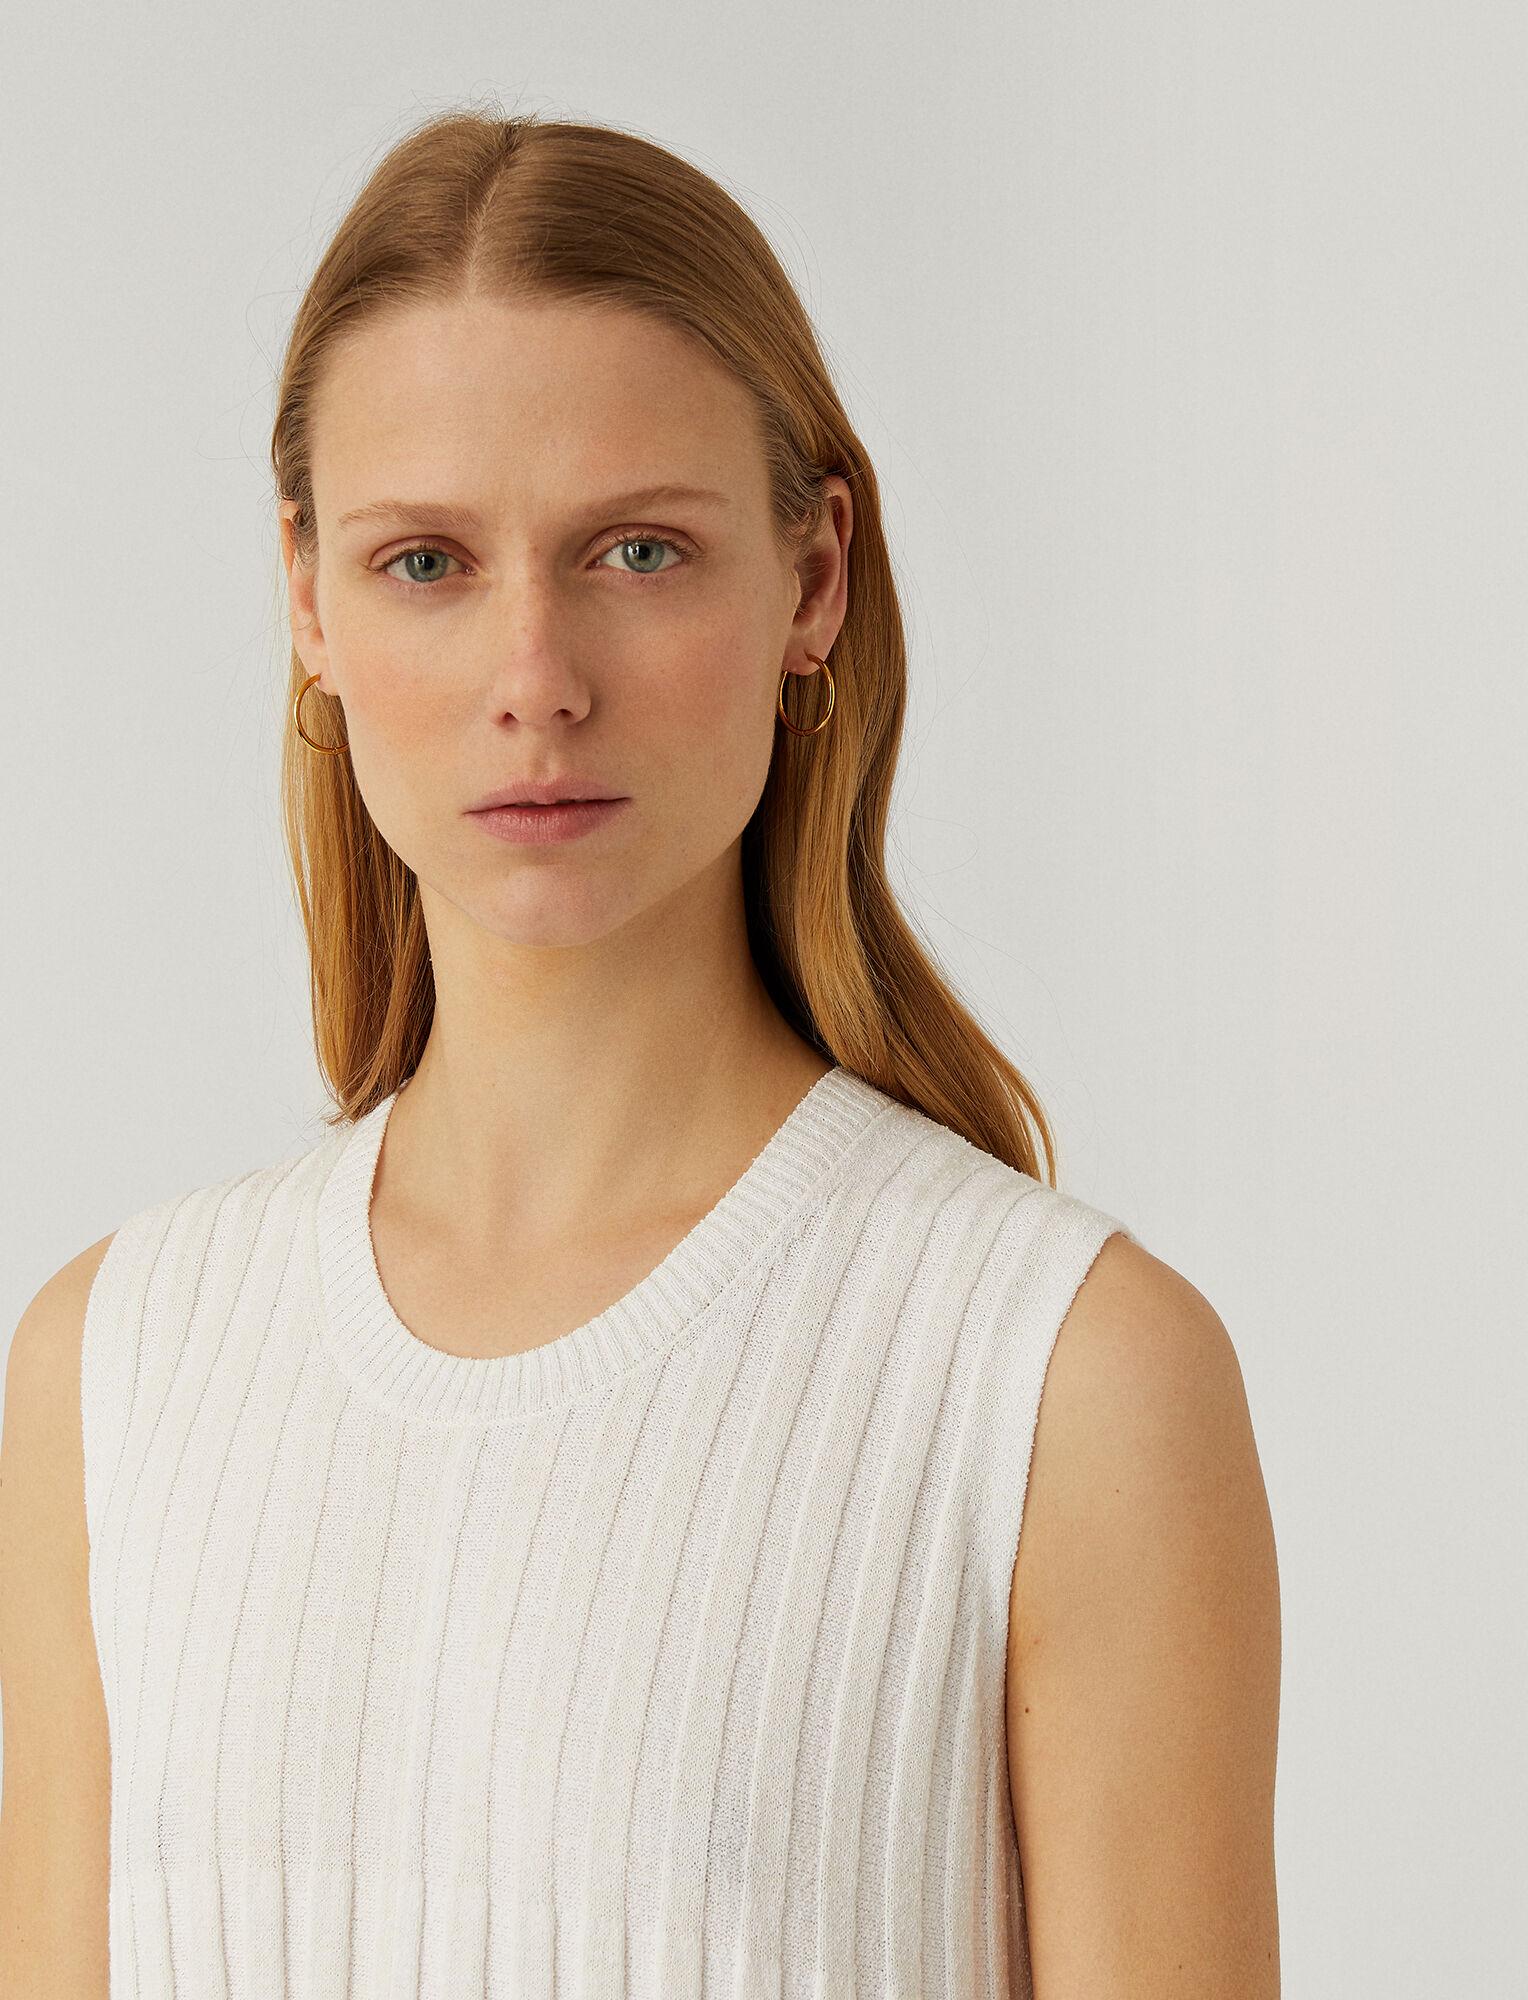 Joseph, Textured Rib Dress, in OFF WHITE